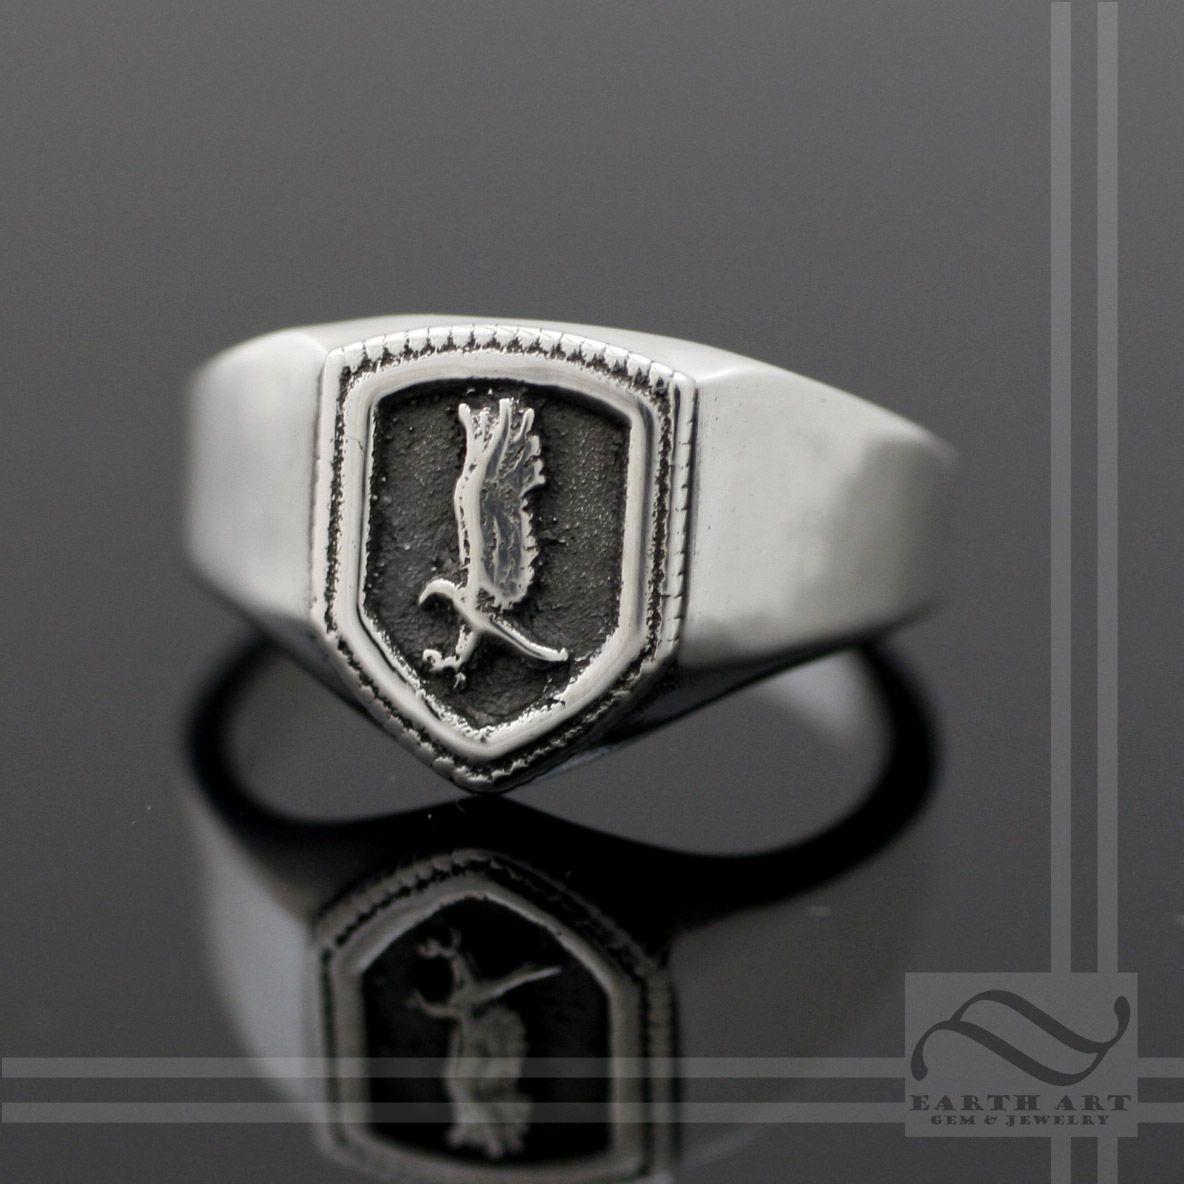 harry potter wedding ring harry potter wedding bands Harry potter wedding ring Harry Potter Wedding Bands